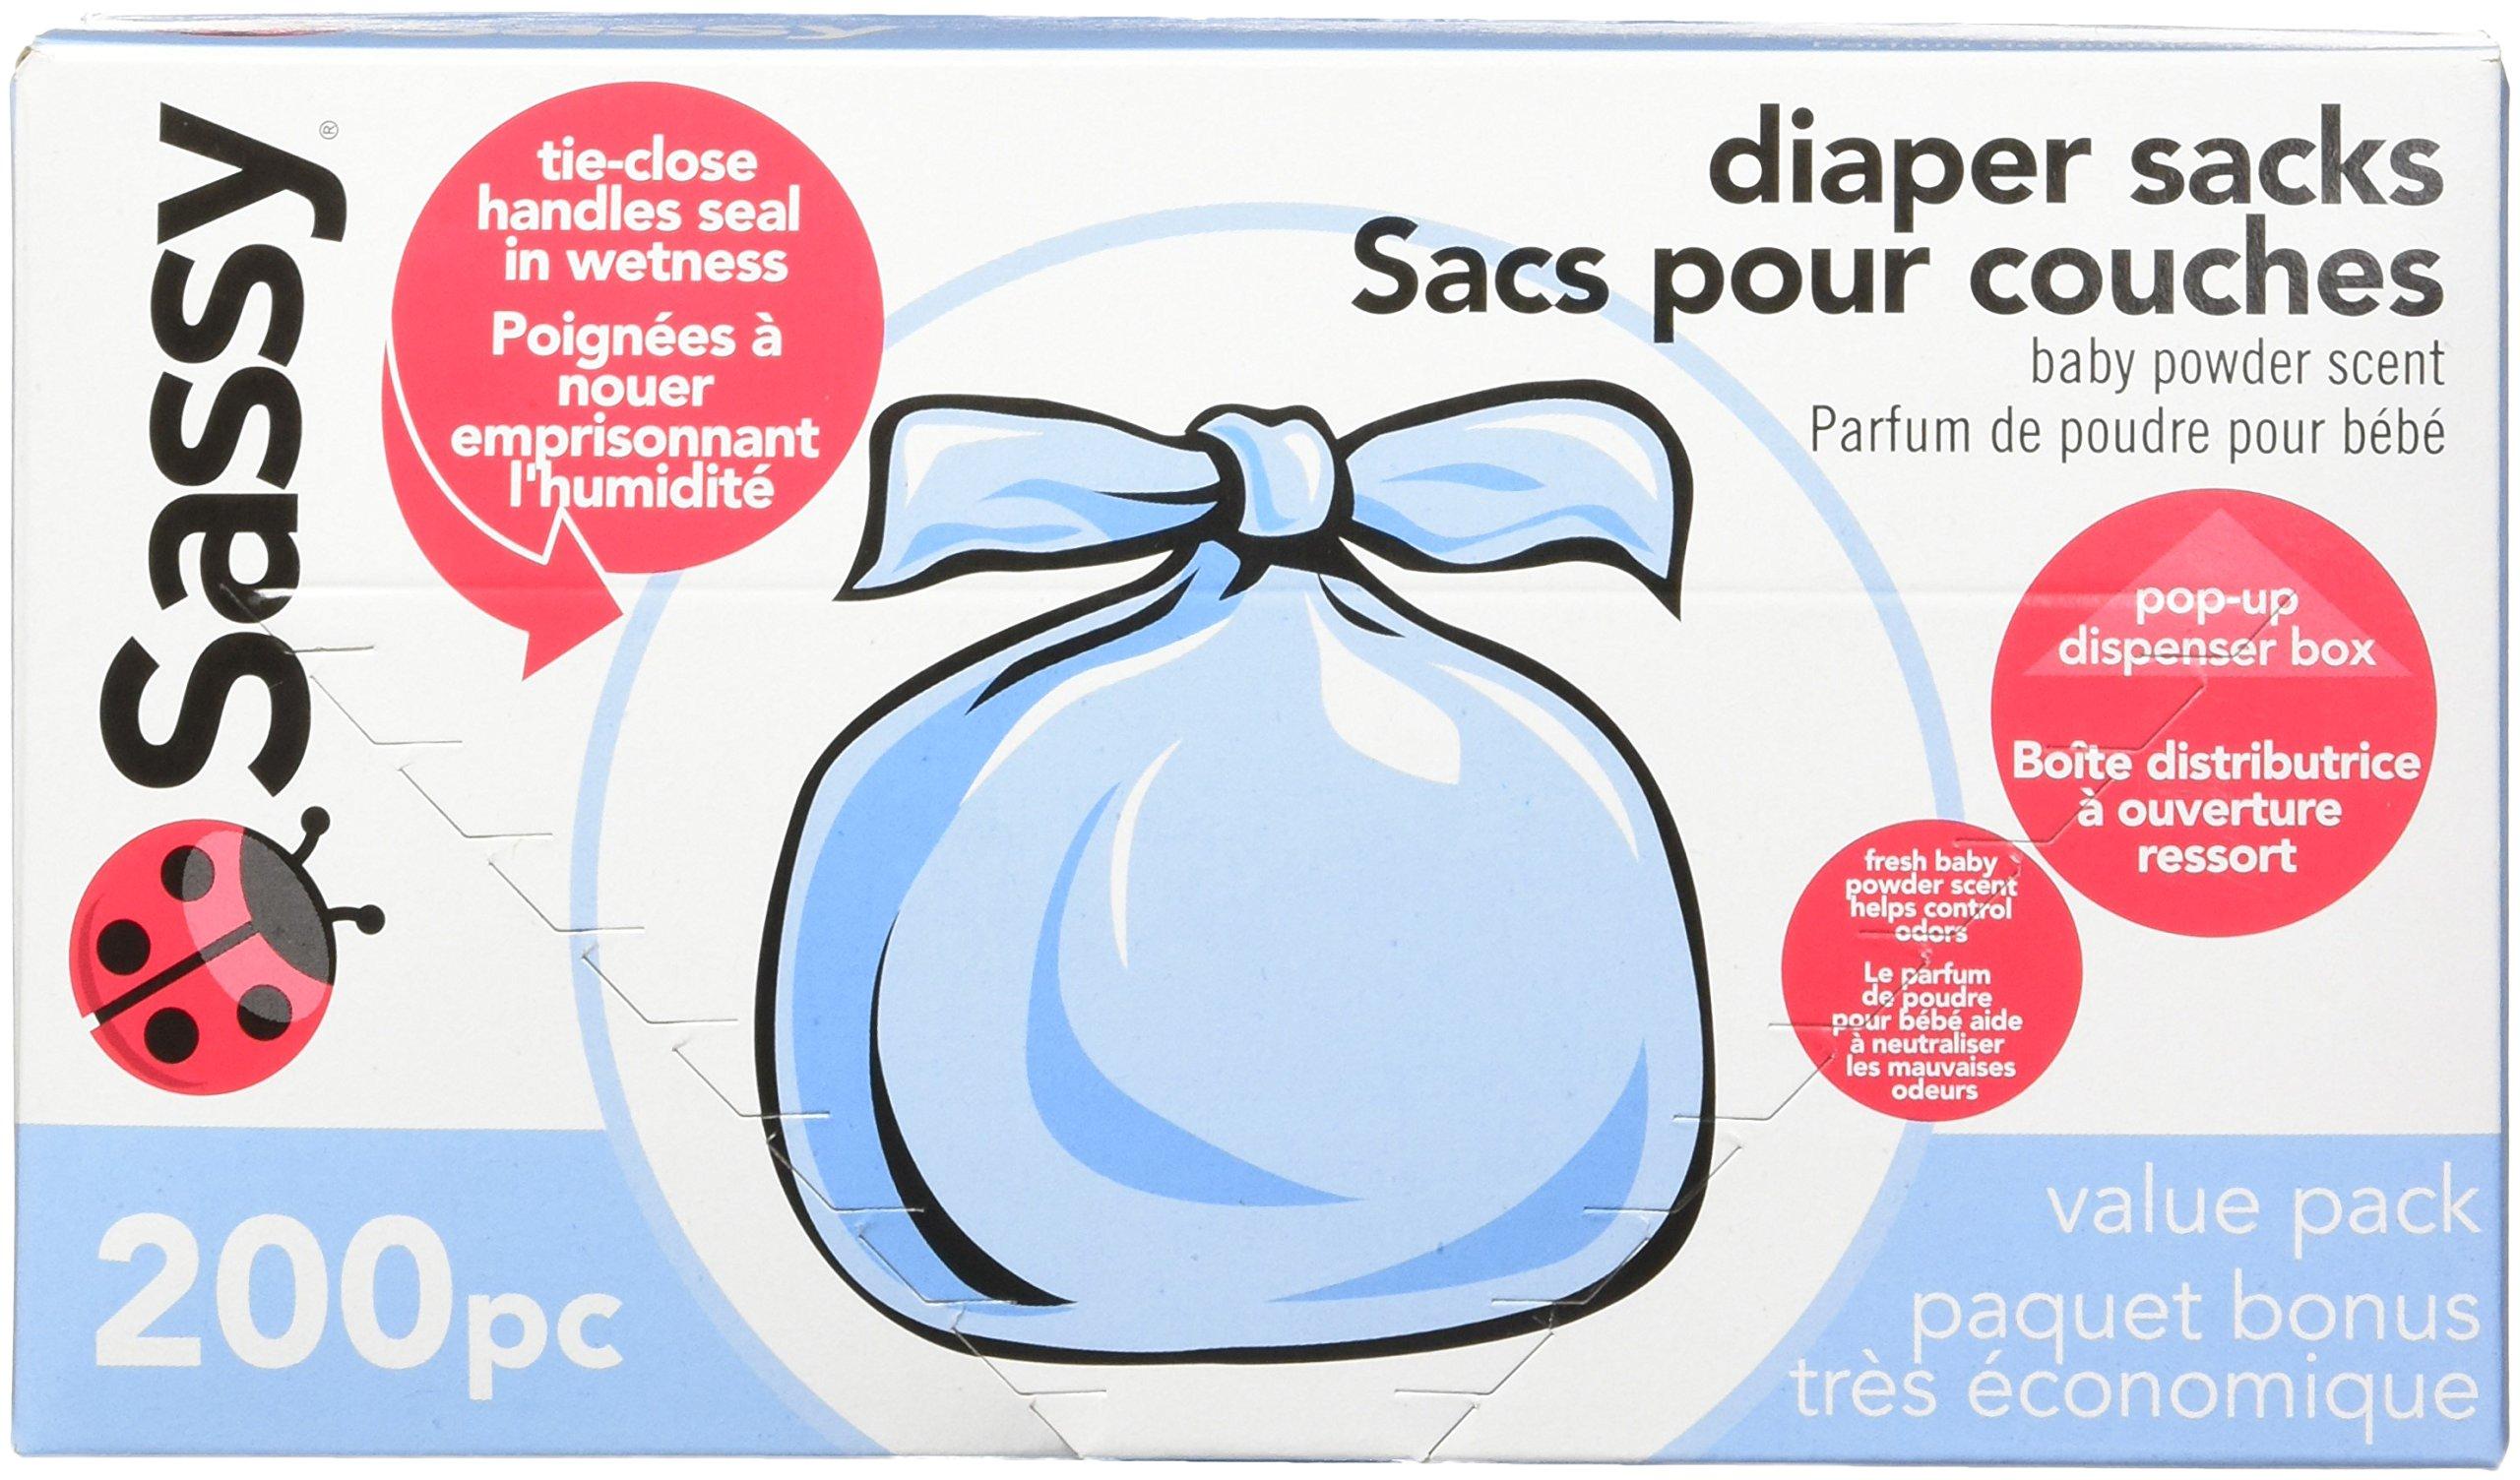 Sassy Disposable Diaper Sacks Count